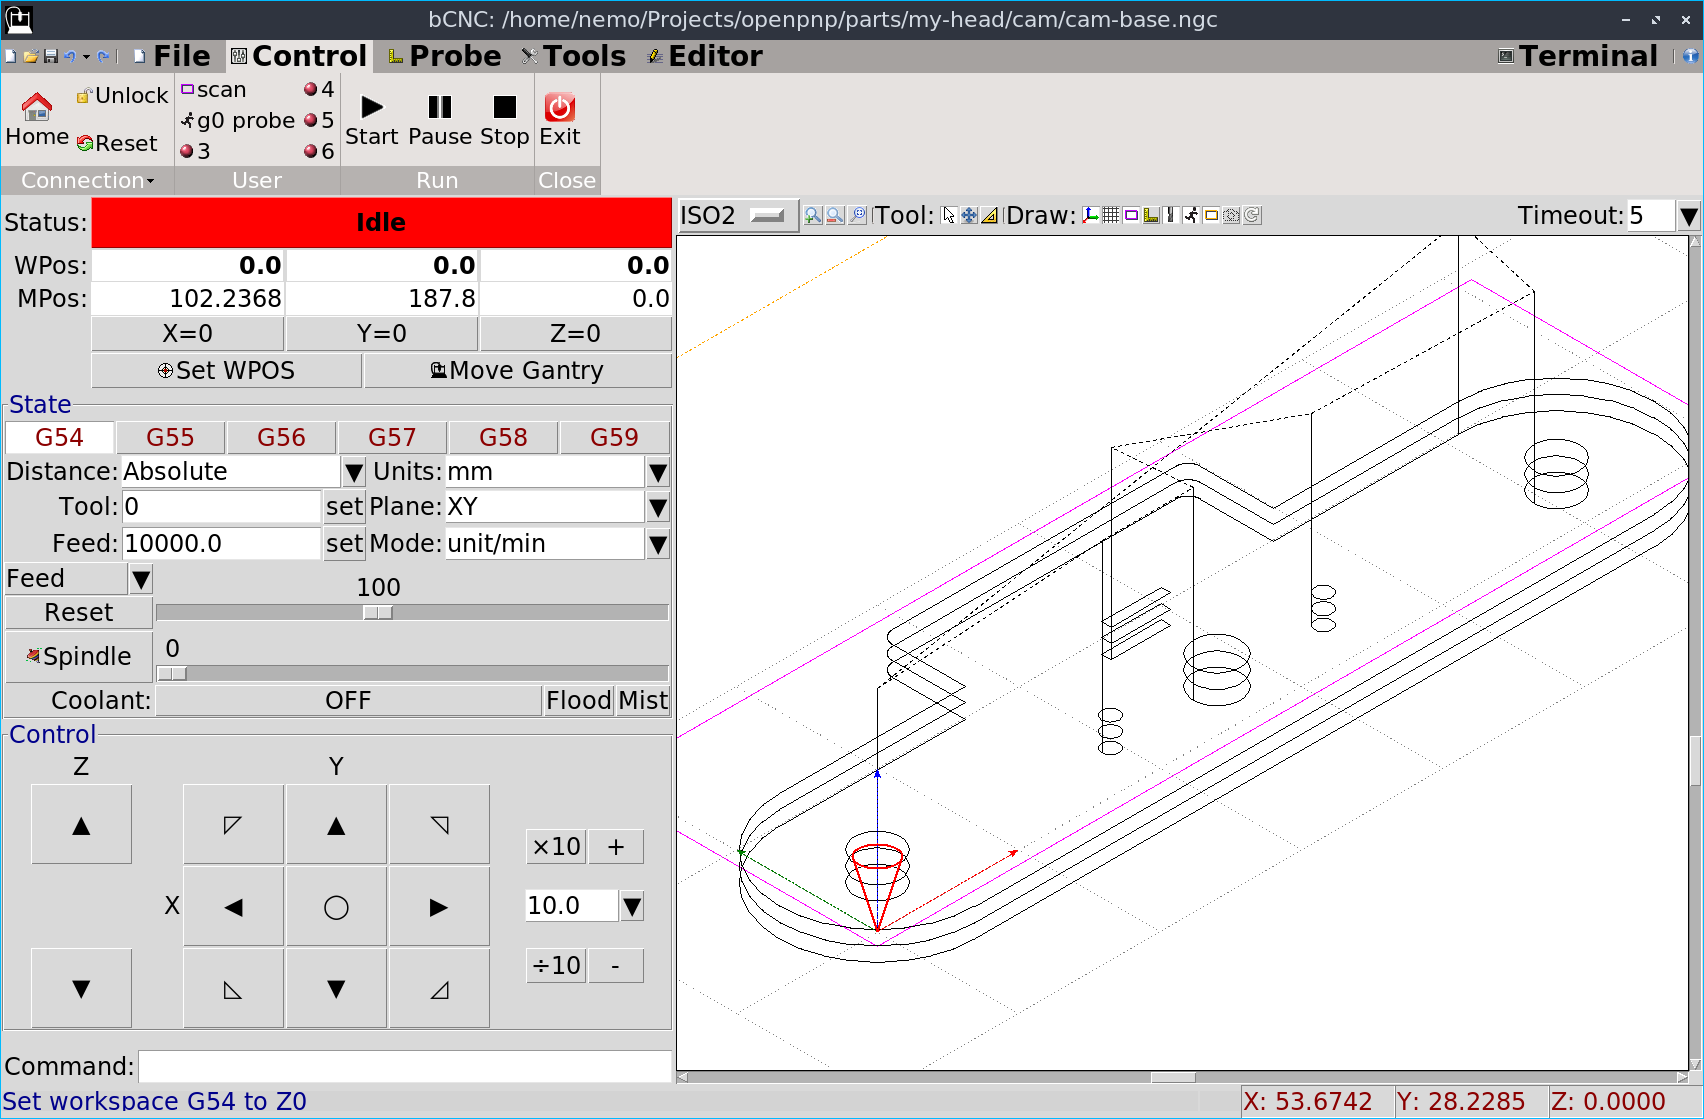 bCNC---home-nemo-Projects-openpnp-parts-my-head-cam-cam-base.ngc_234